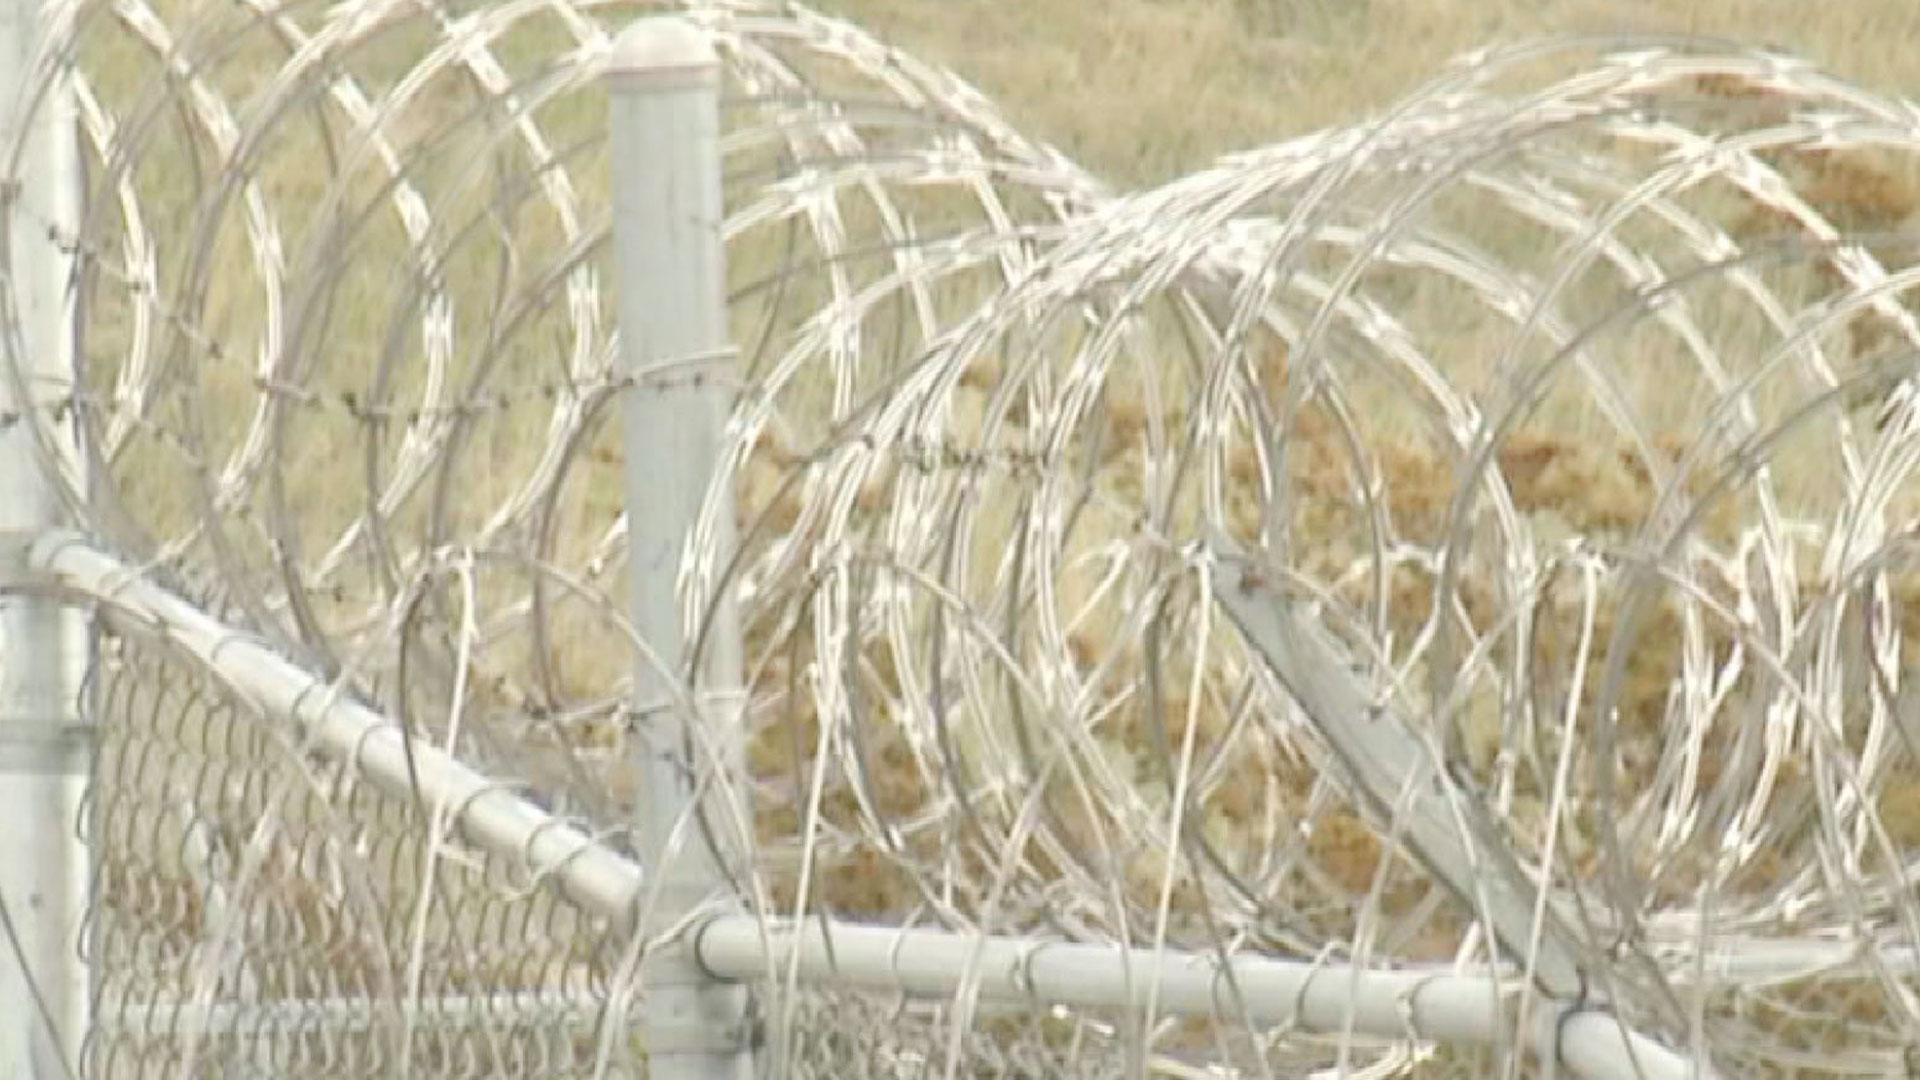 KELO Prison Jail